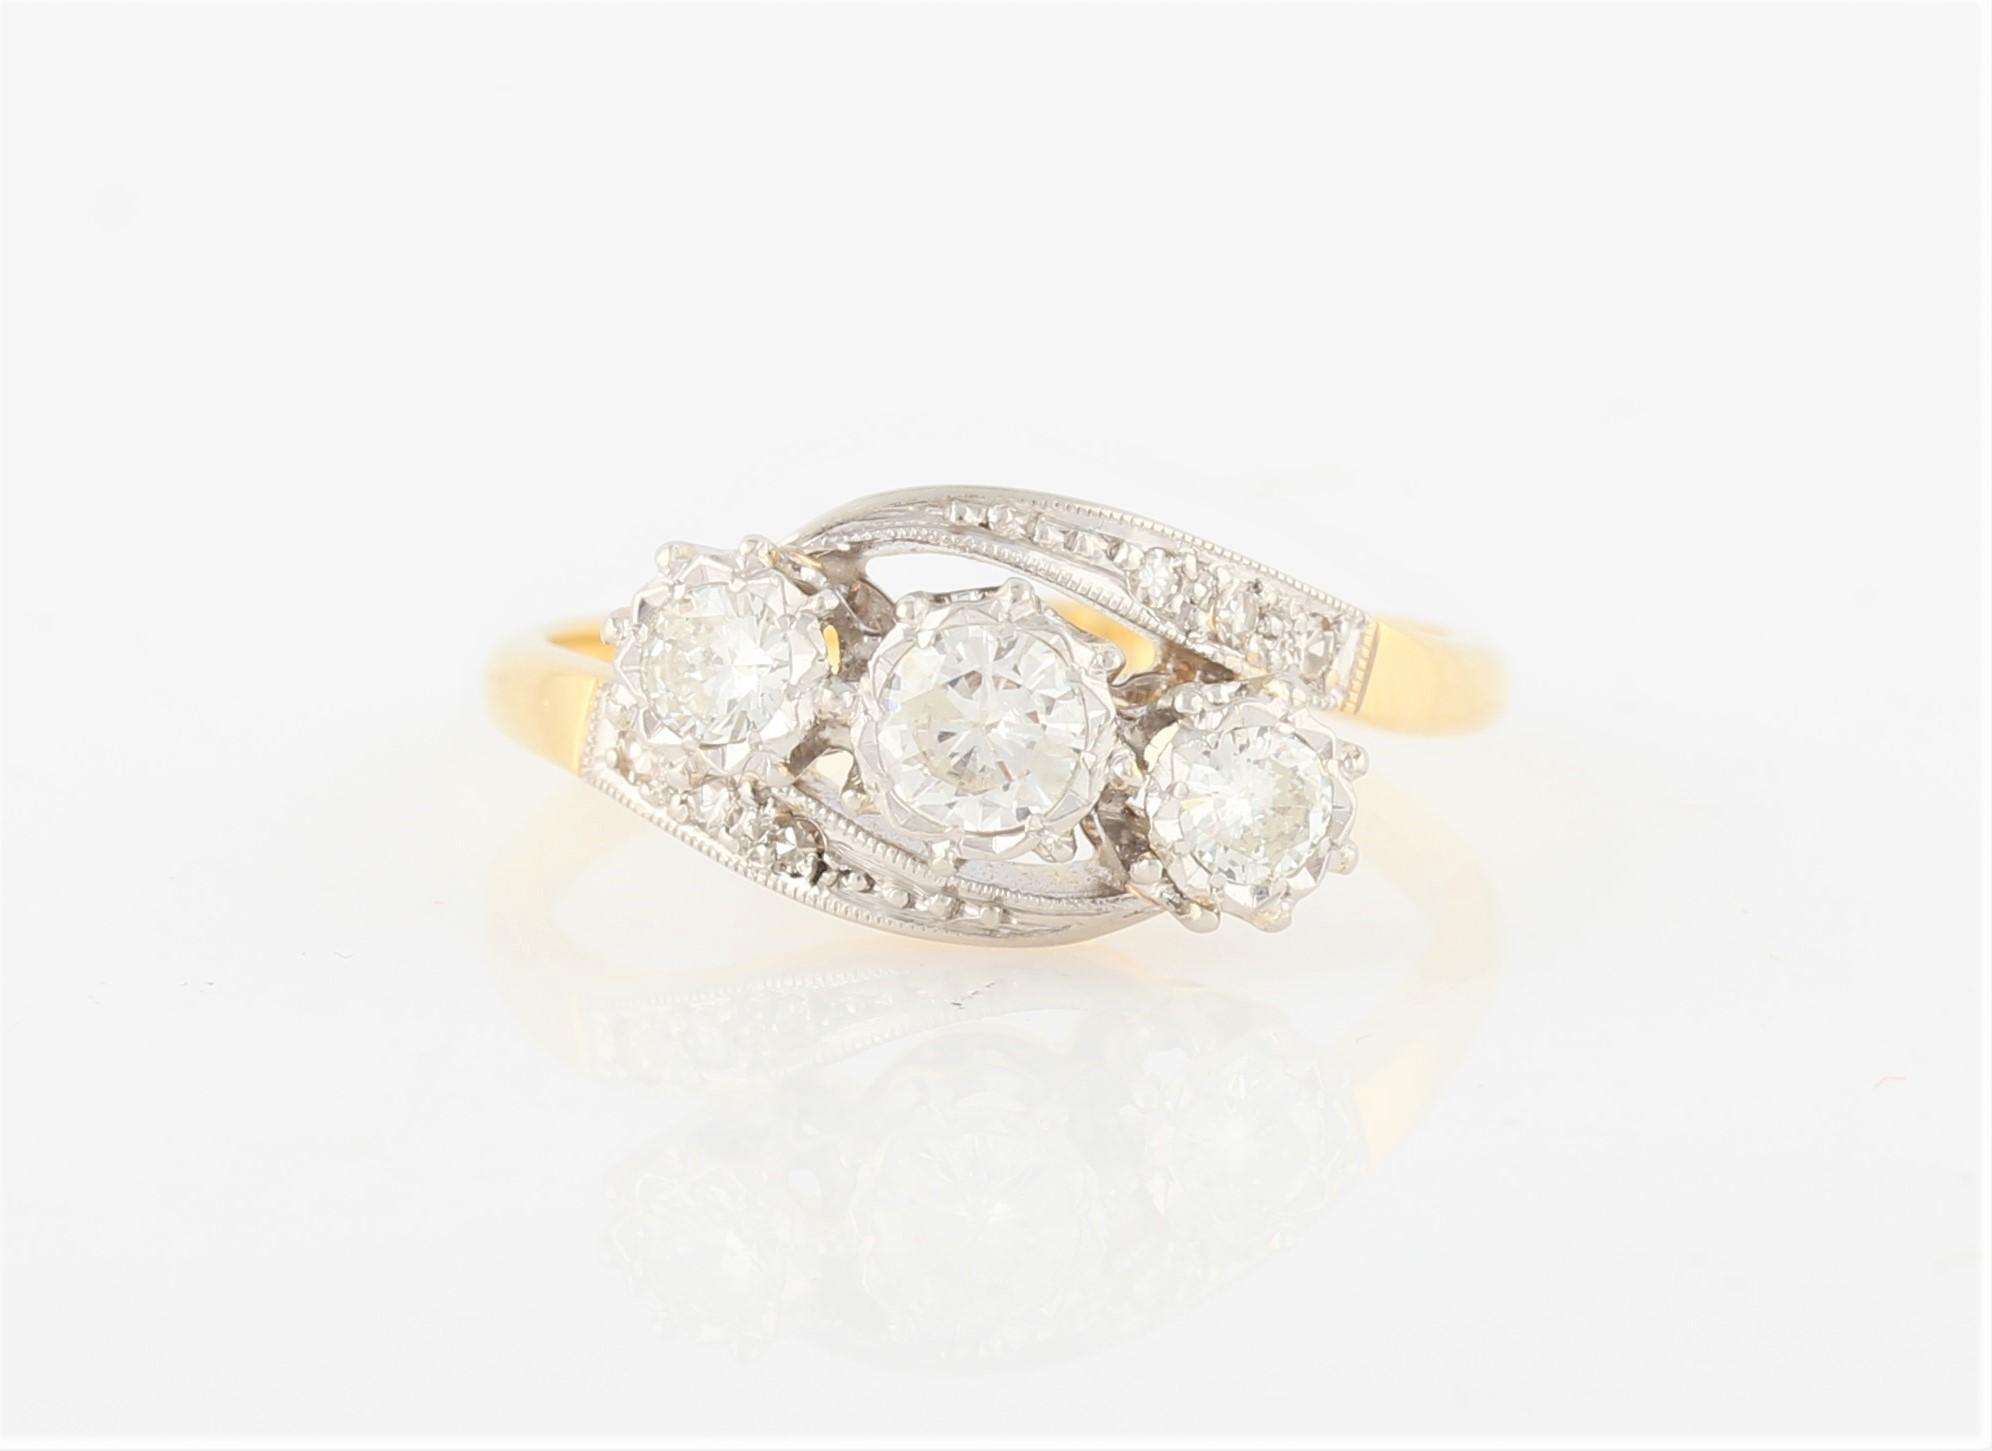 Lot 48 - A three stone diamond ring, set with three graduated round brilliant cut diamonds in cross over